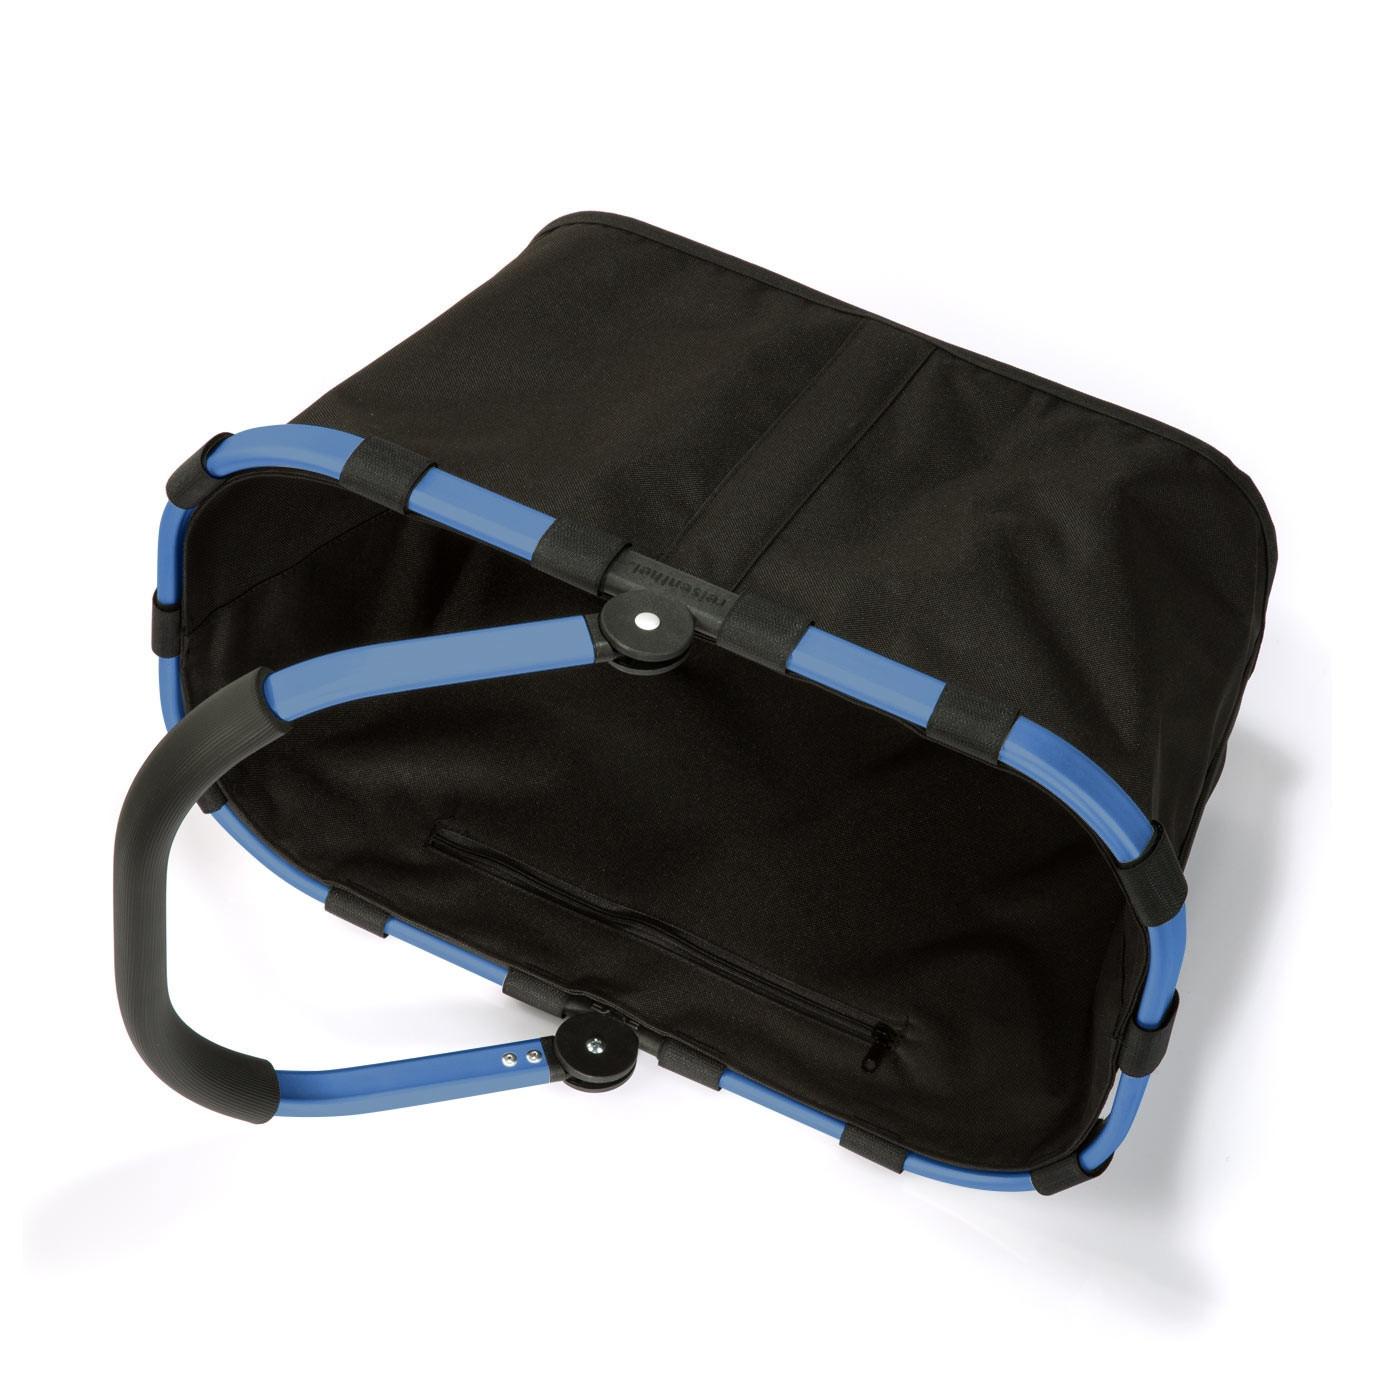 reisenthel® carrybag 22l blue frame / black BK7042 GRATIS